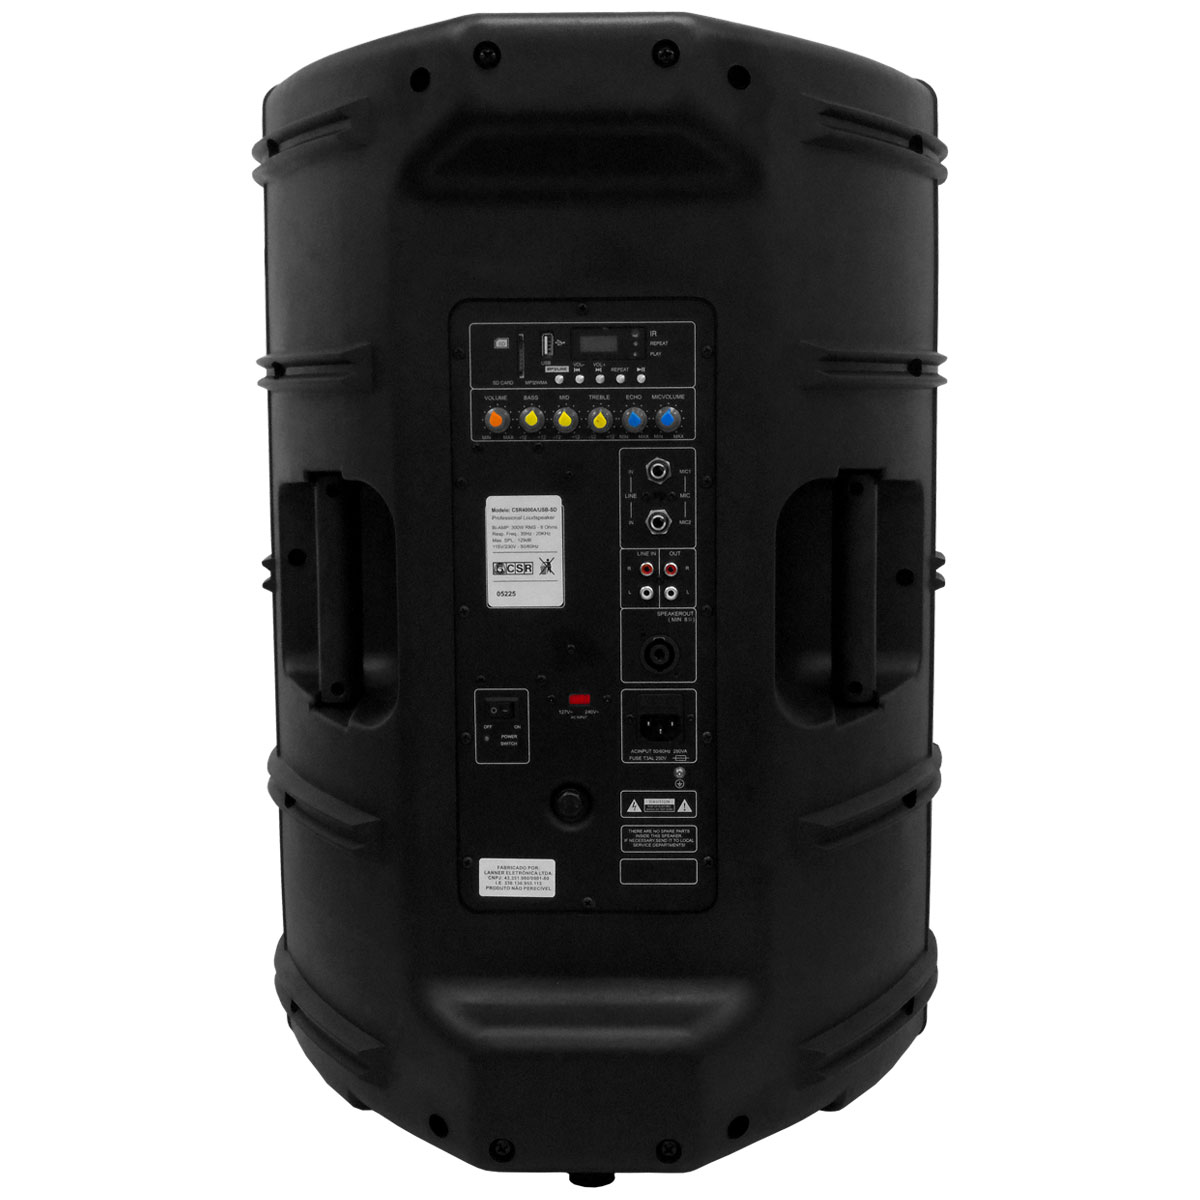 CAIXA AMPLIFICADA CSR 4000 A 15 Polegadas 300W c/ USB / BLUETOOTH